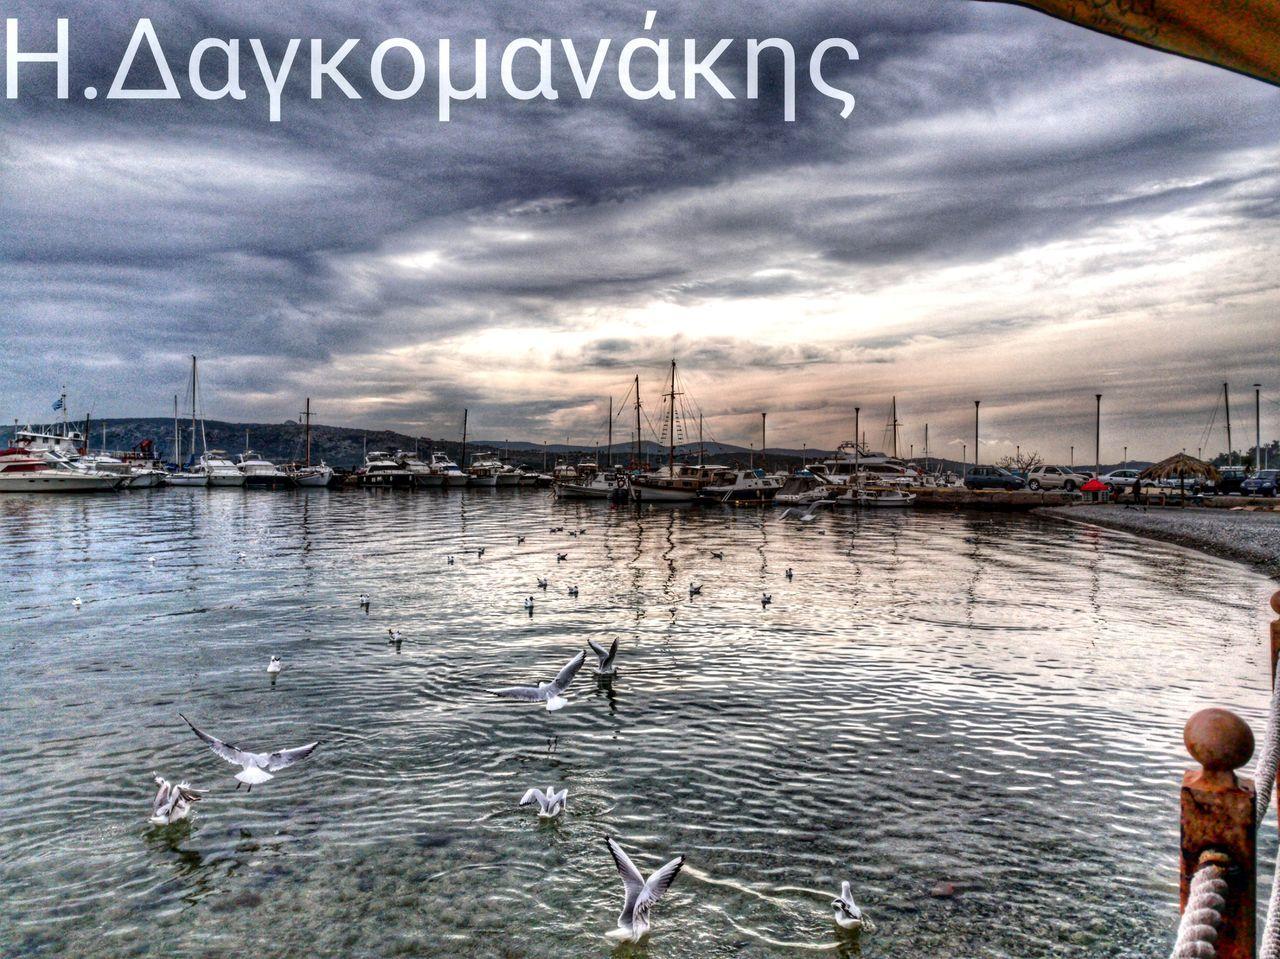 Hellas GREECE ♥♥ Mountains Sky Porn Sky And Clouds Sky Colors Seagulls And Sea Ducks Hdr Edit Nea Peramos Nature Photocontestgr The City Light